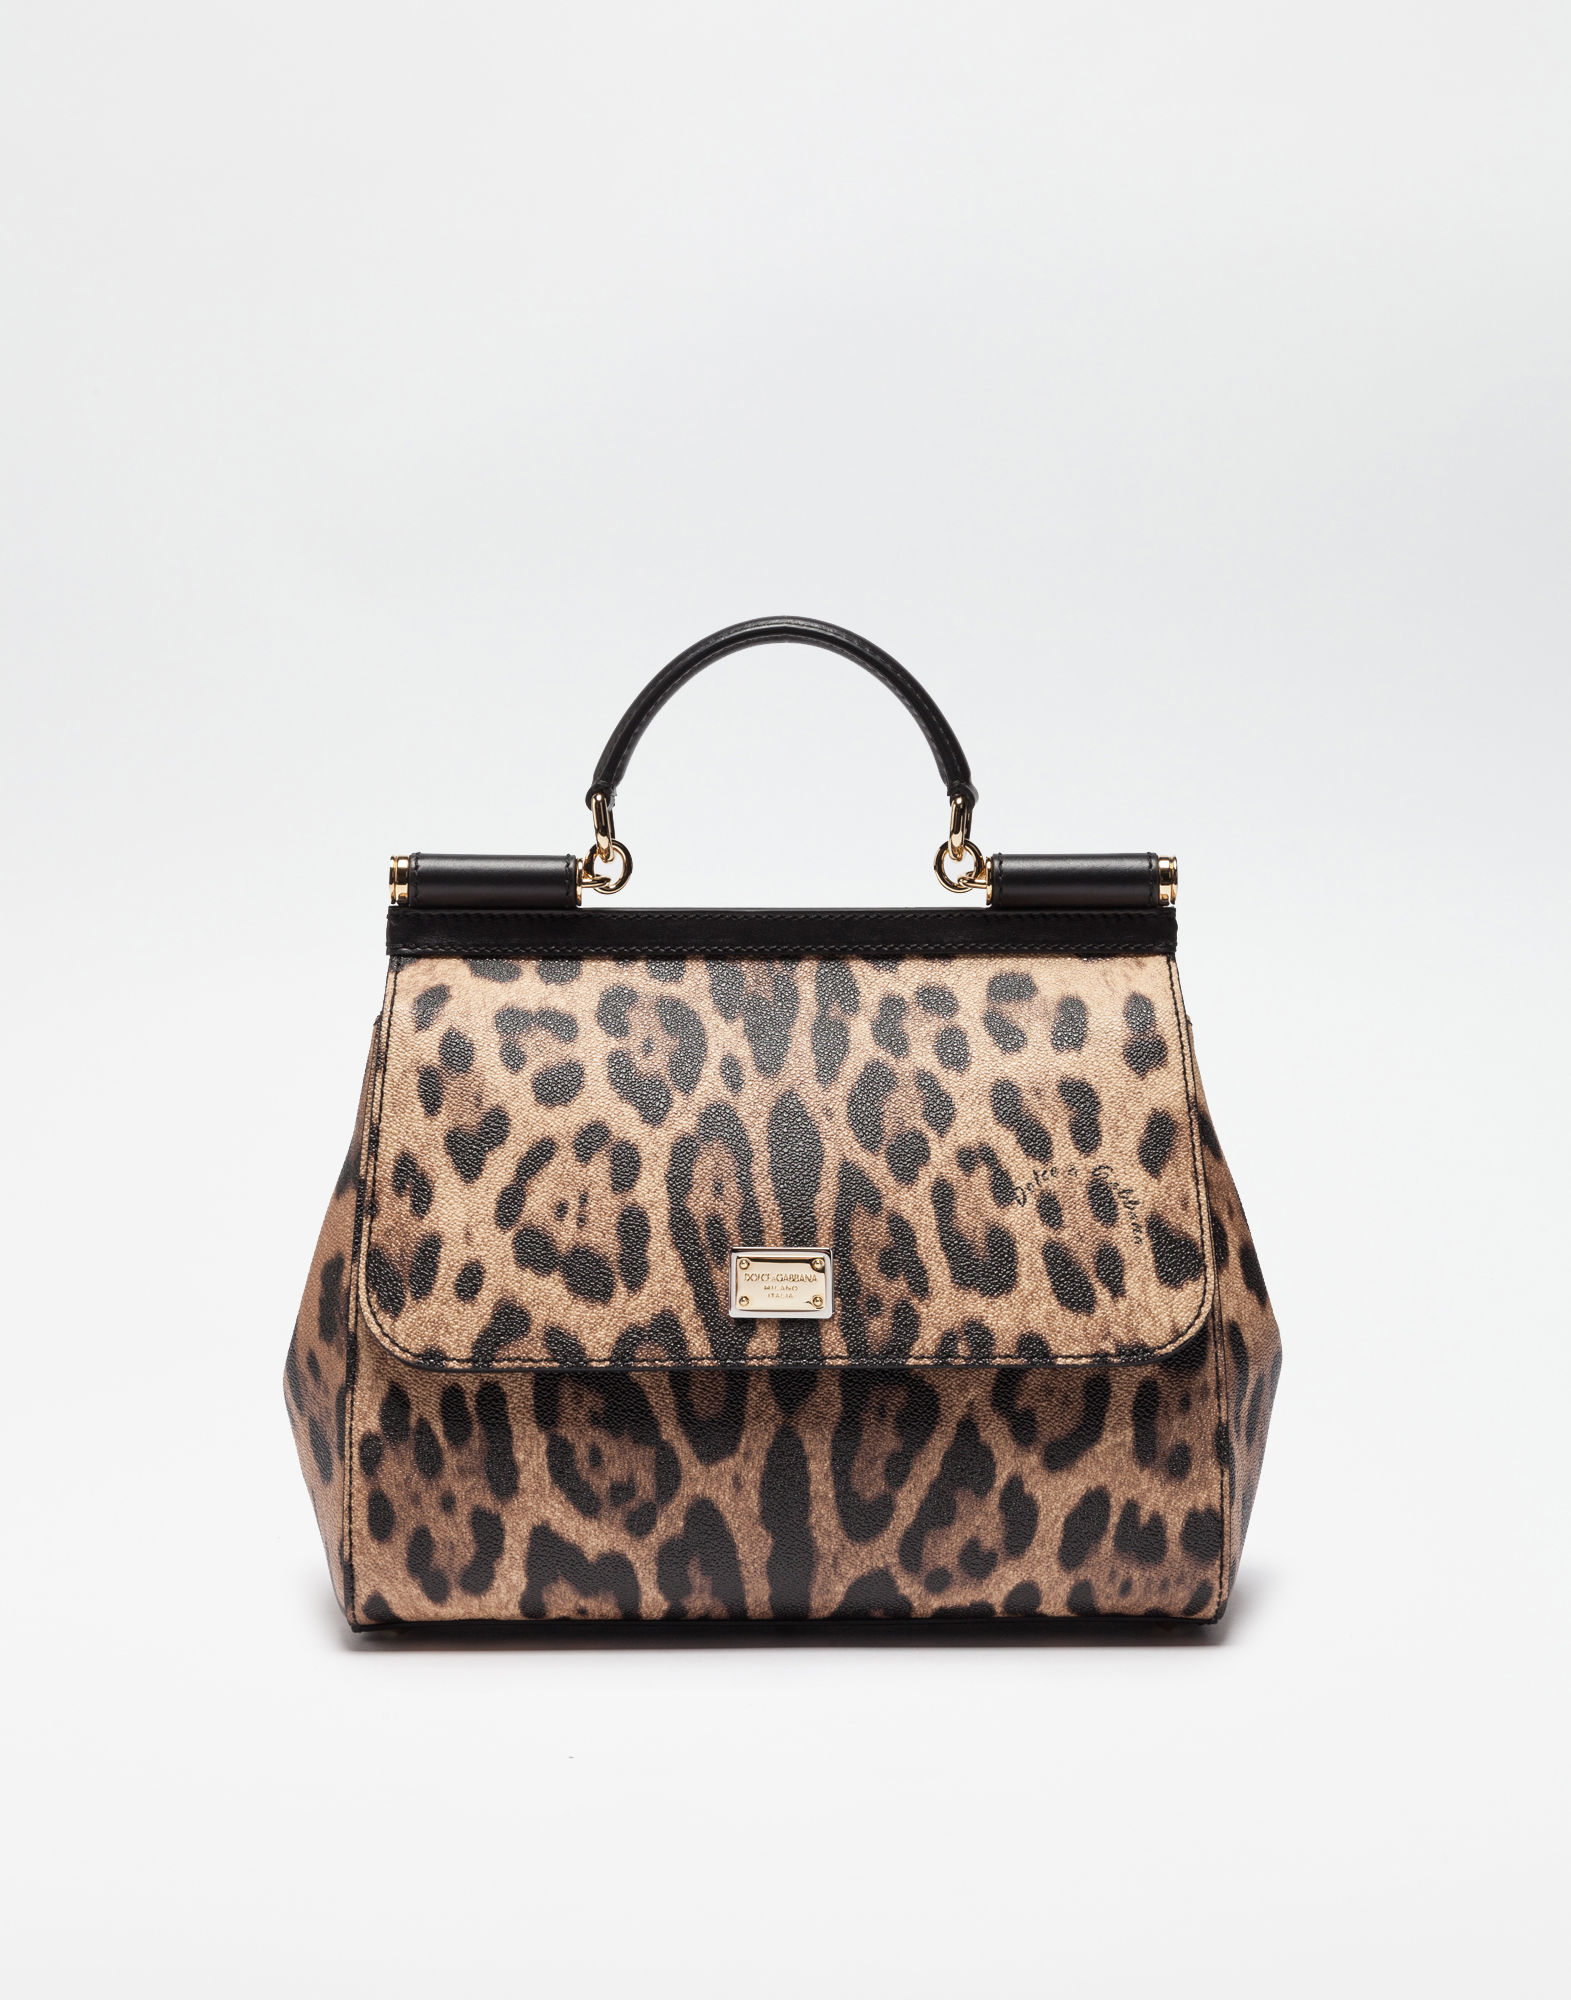 1890b8e4fd Dolce   Gabbana Woman Sicily Leopard-Print Textured-Leather Shoulder Bag  Animal Print In